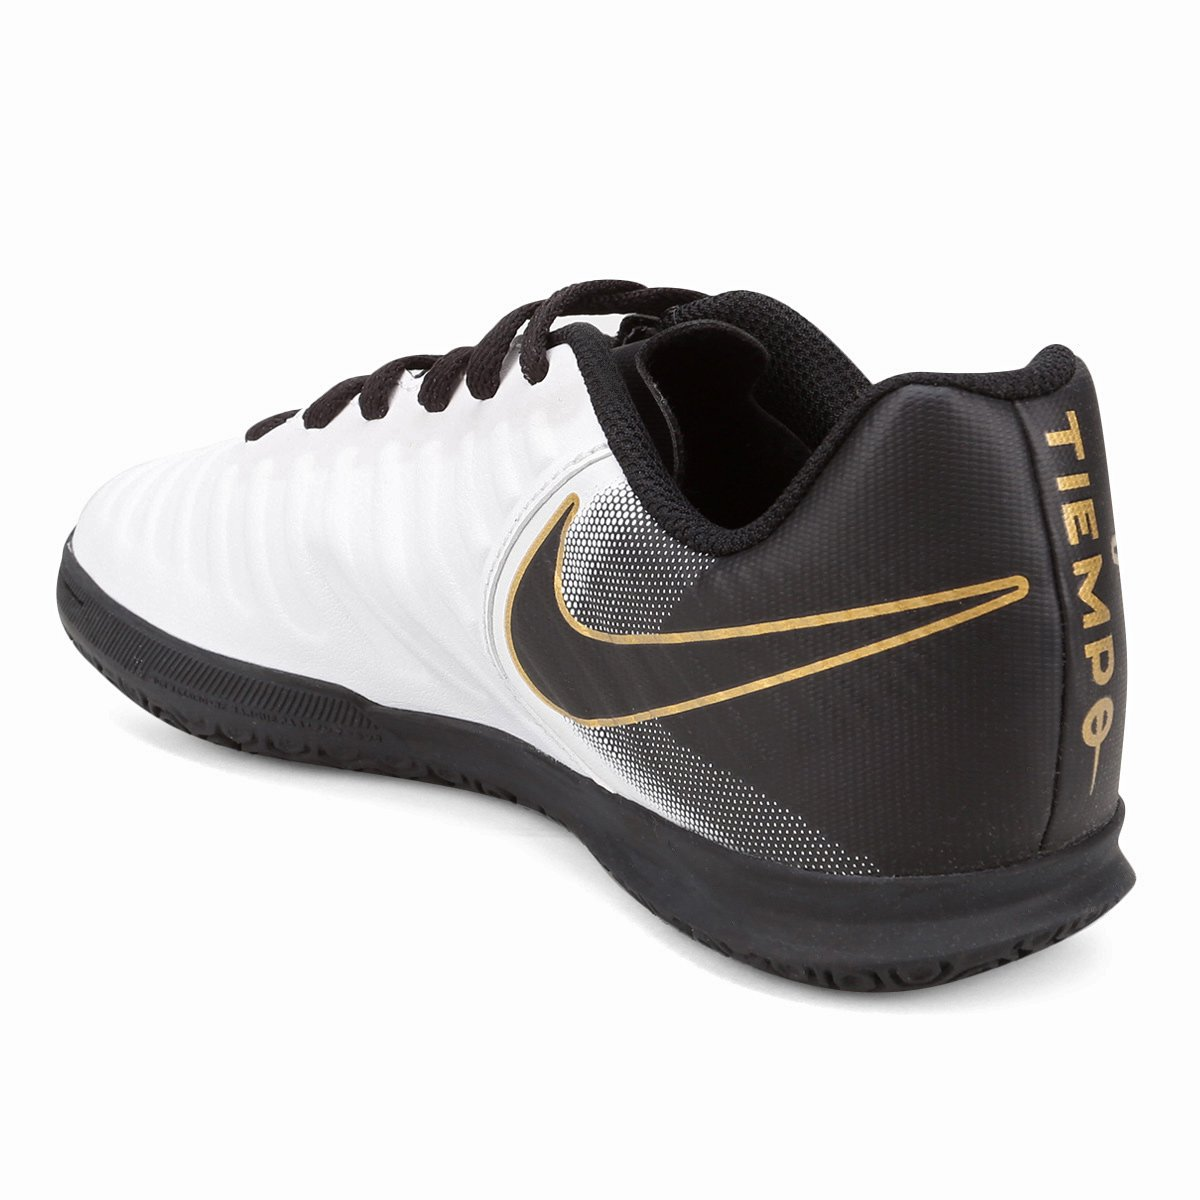 d1f1a916a0 Chuteira Futsal Infantil Nike Tiempo Legend 7 Club IC - Branco e ...